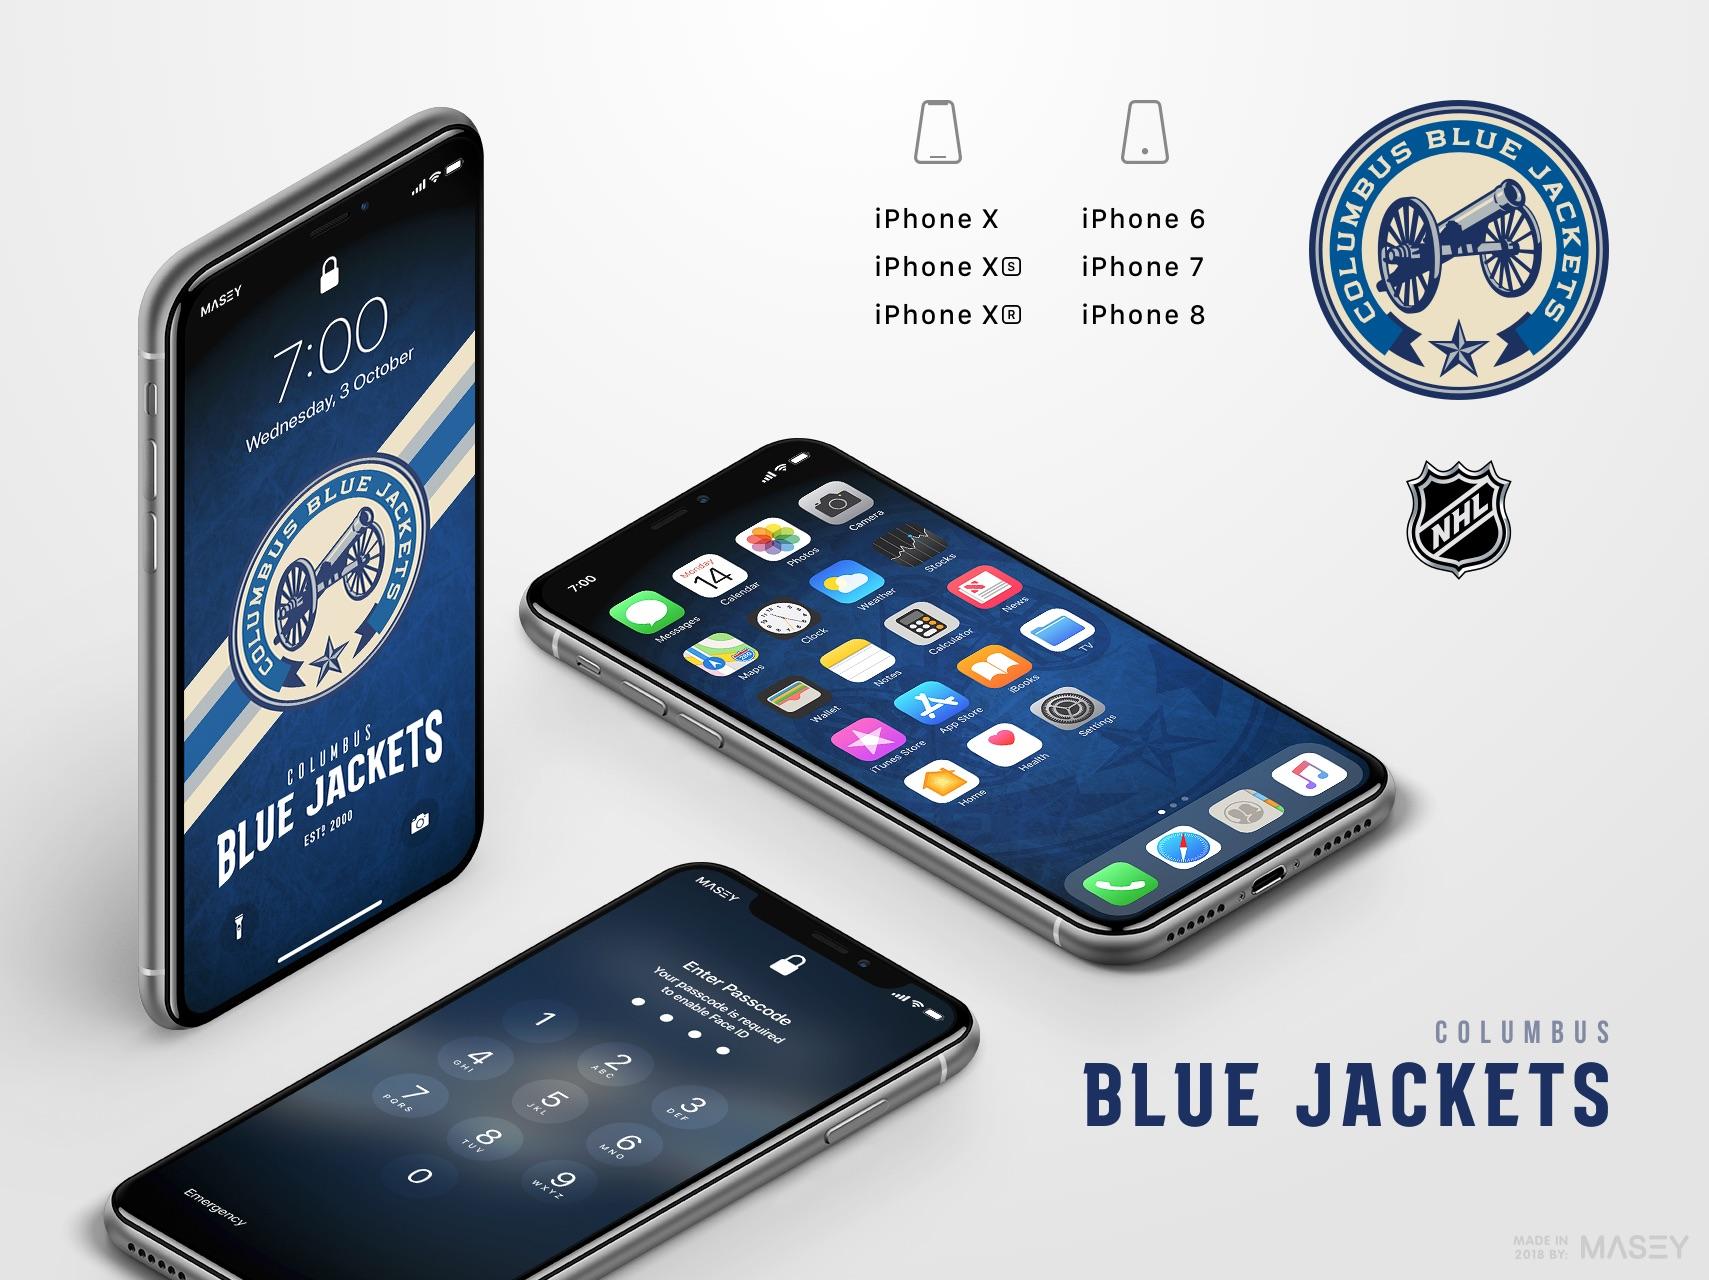 Columbus Blue Jackets iPhone Wallpaper